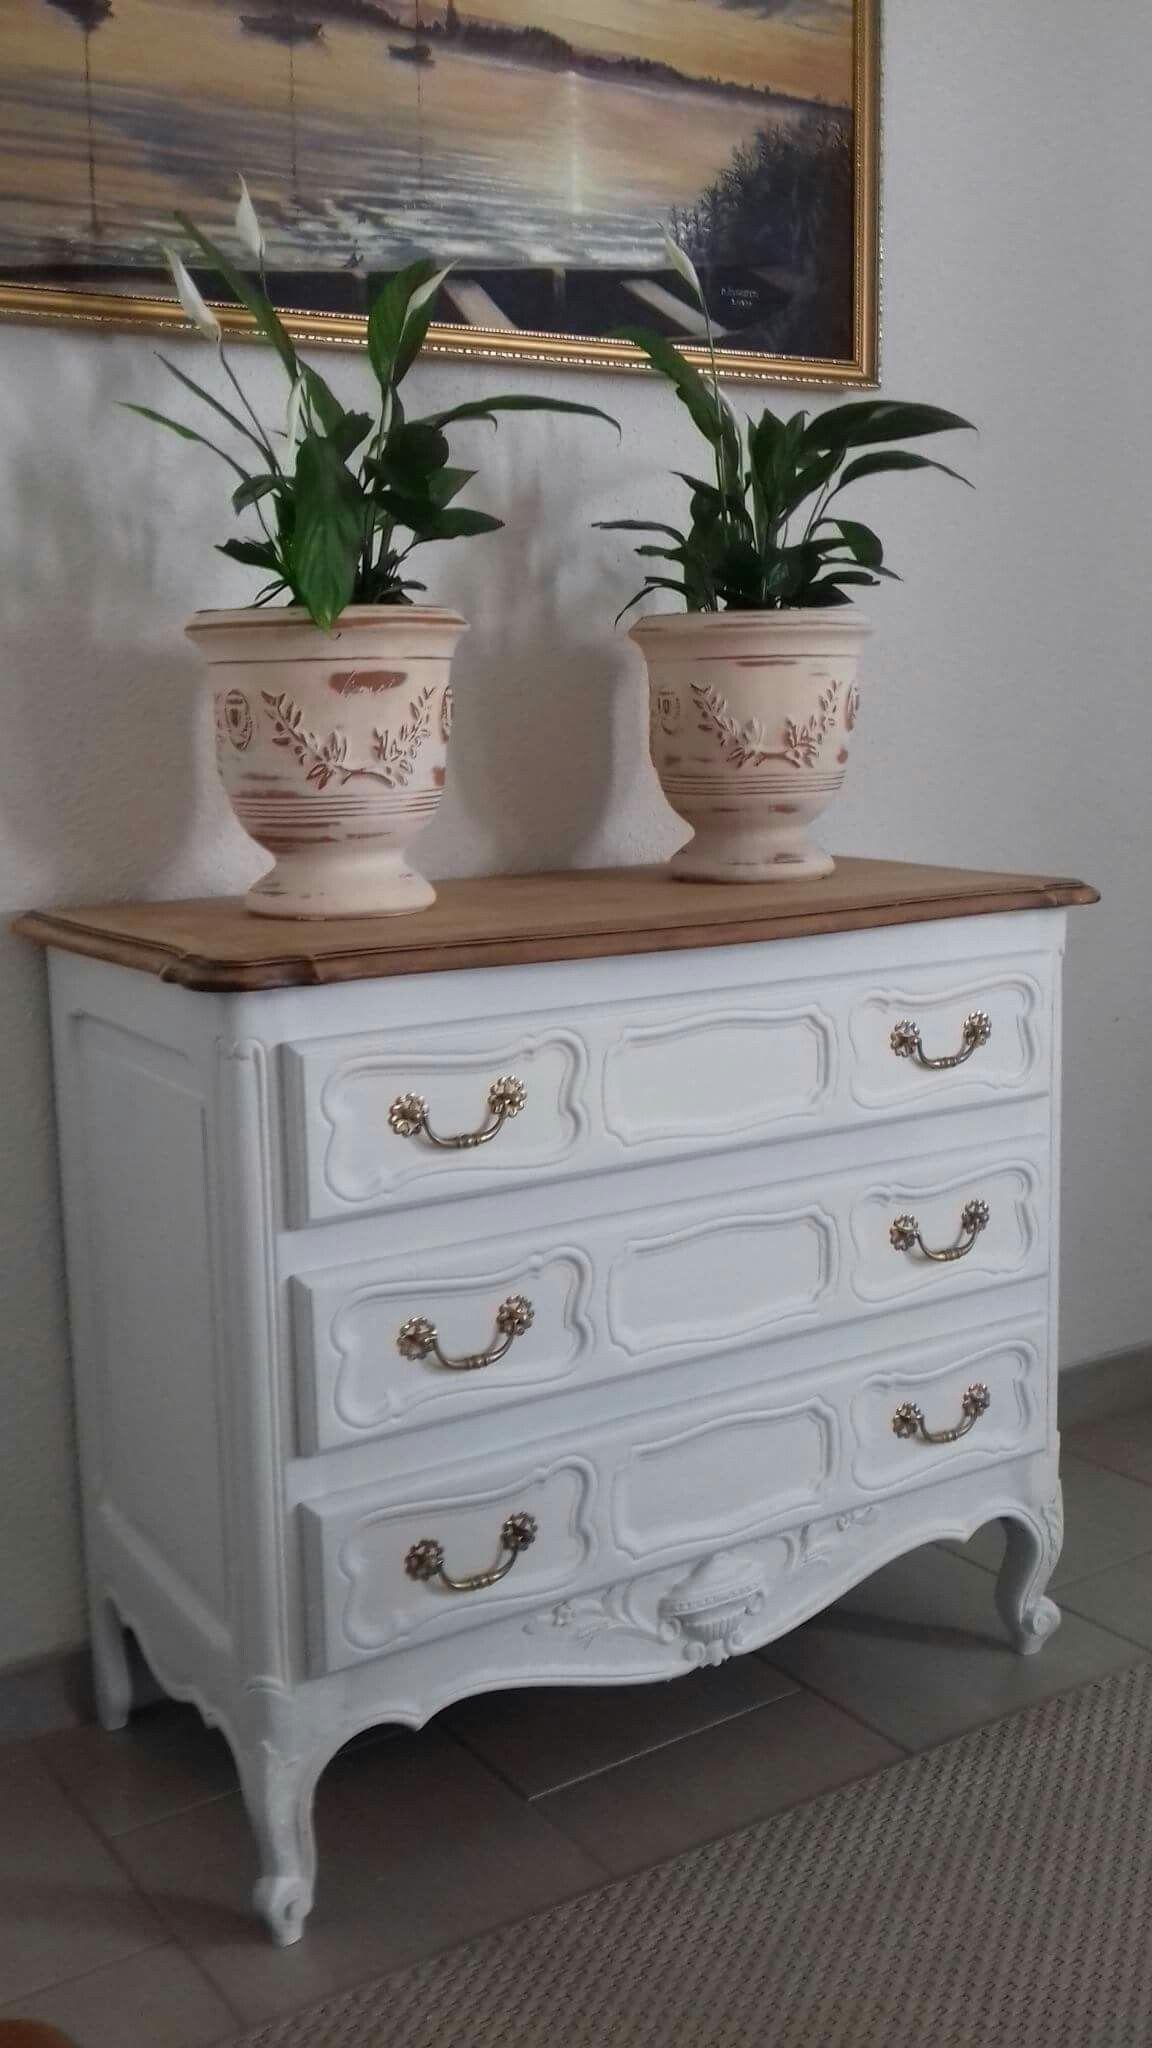 Renovation Relooking Commode Meuble Ancien Bois Commode Poncer Peint Peinture Sol Blanche Poignees Laiton Comoda